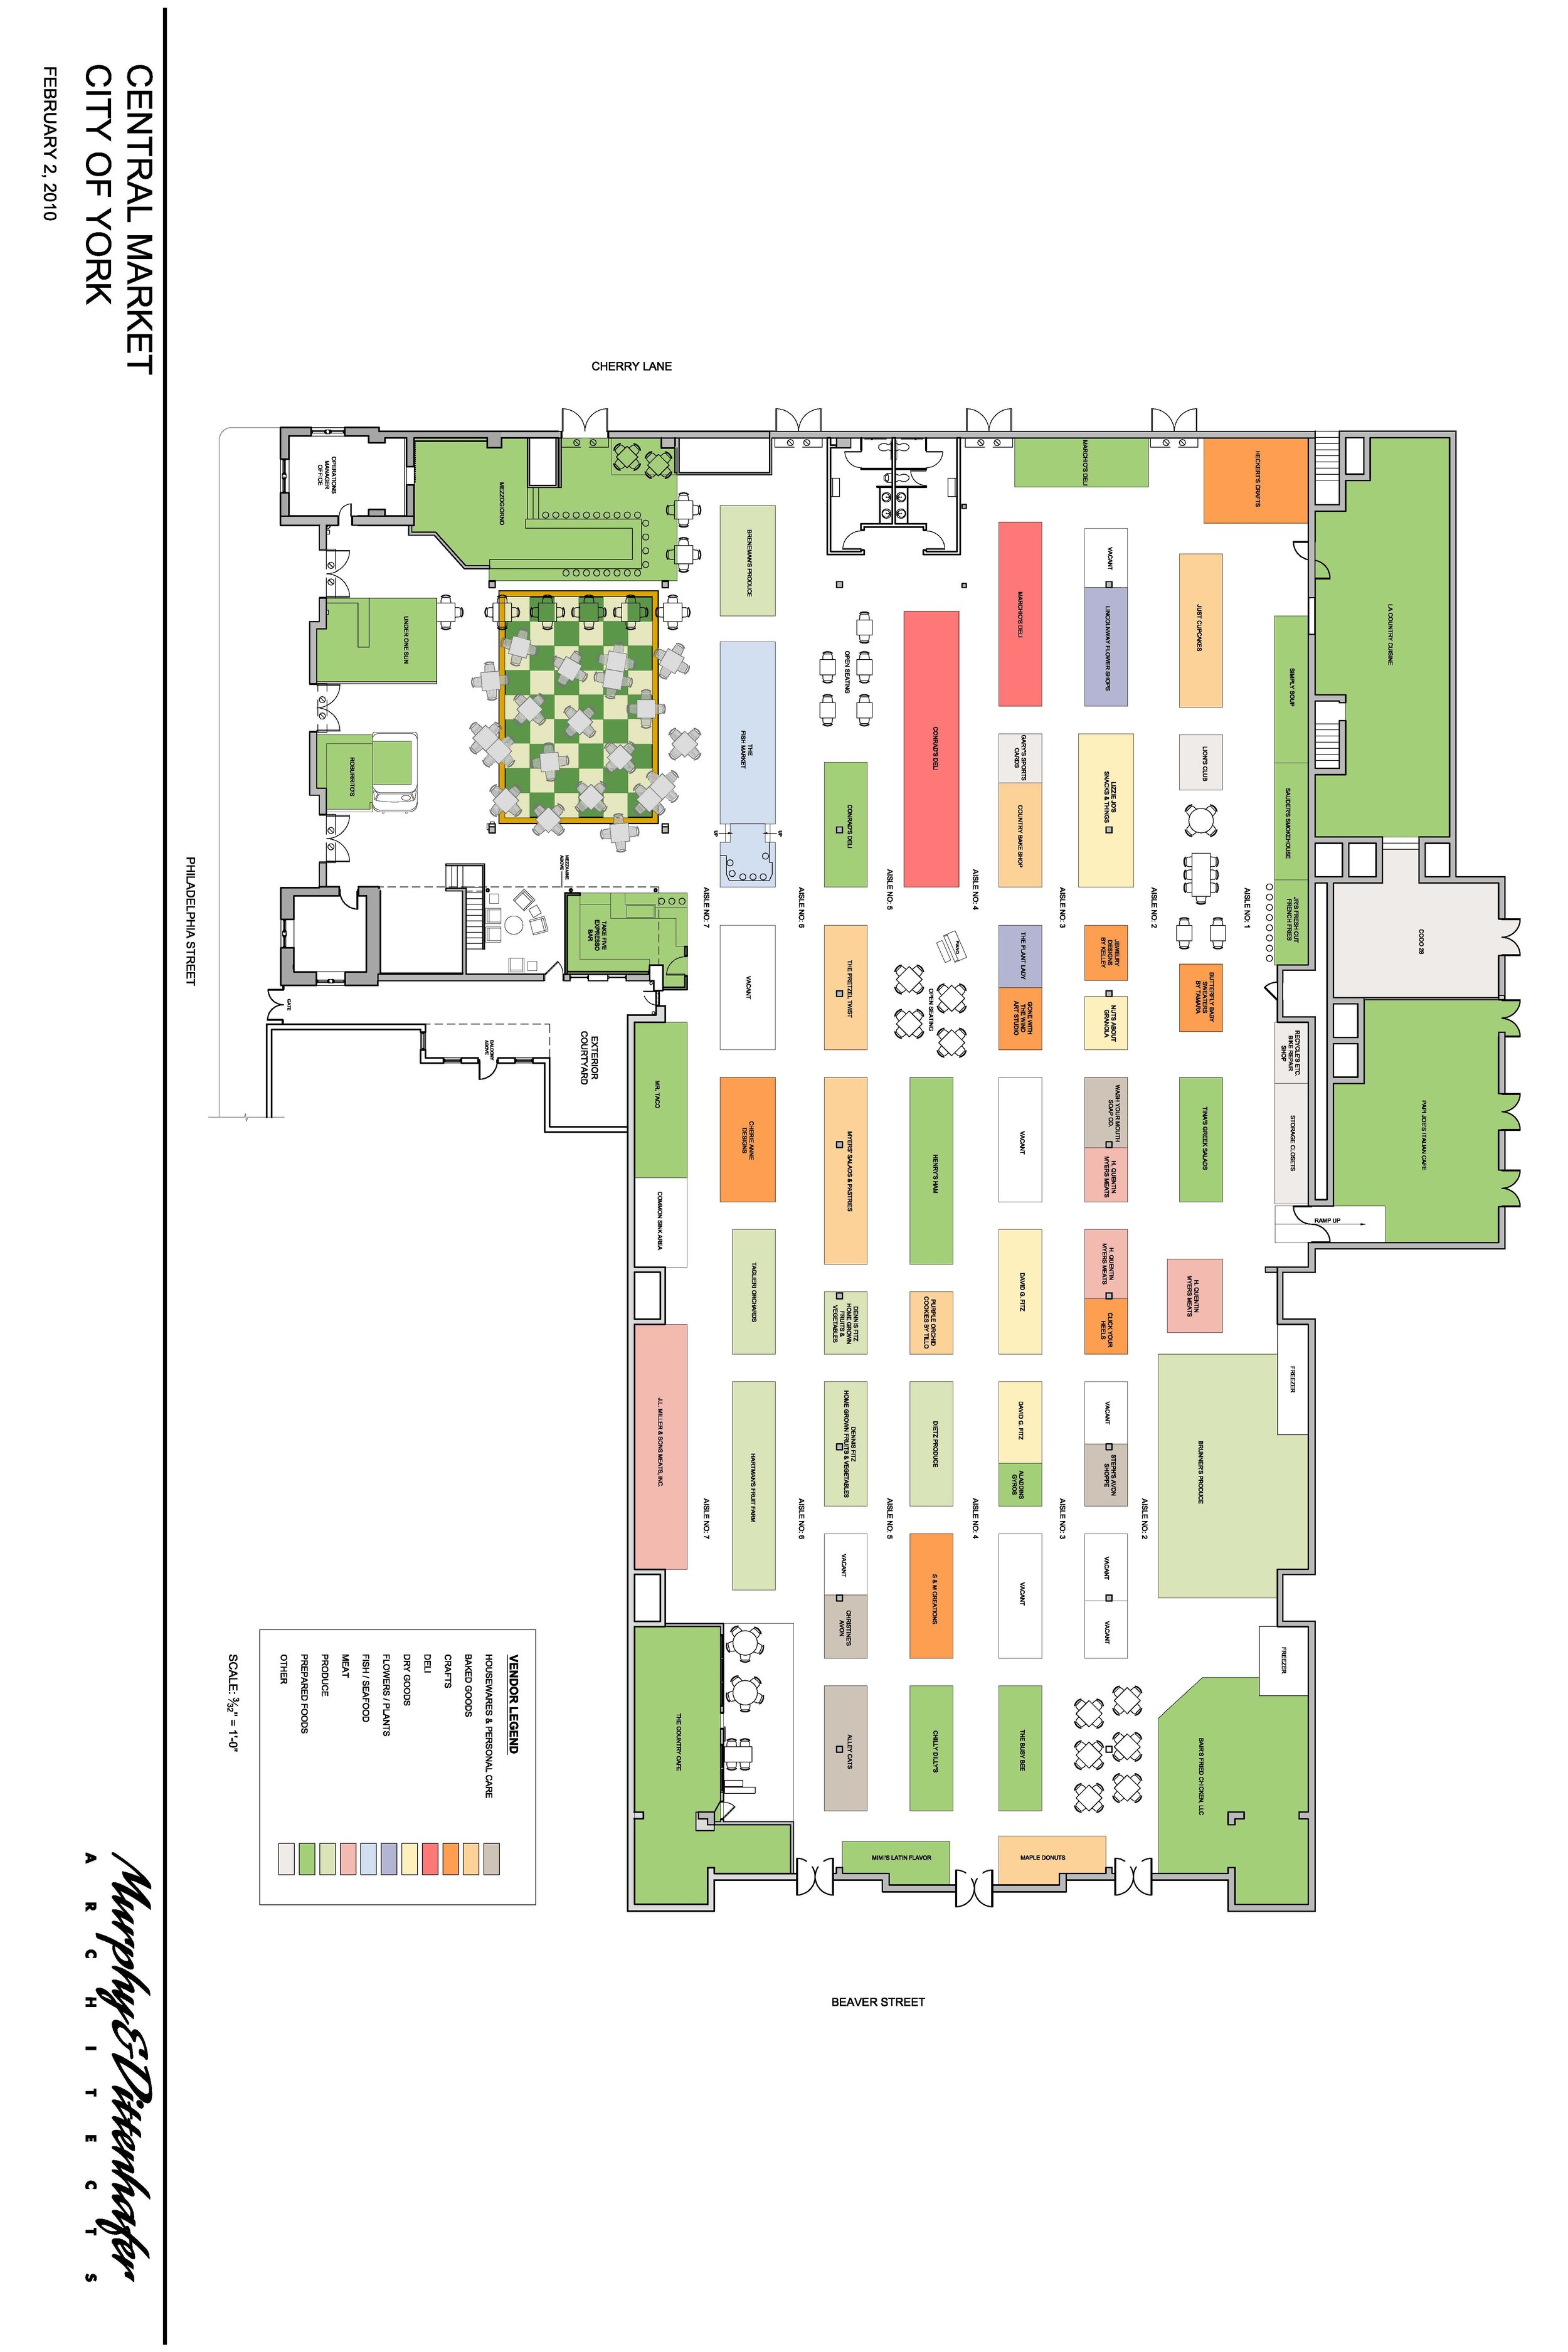 York Central Market plan